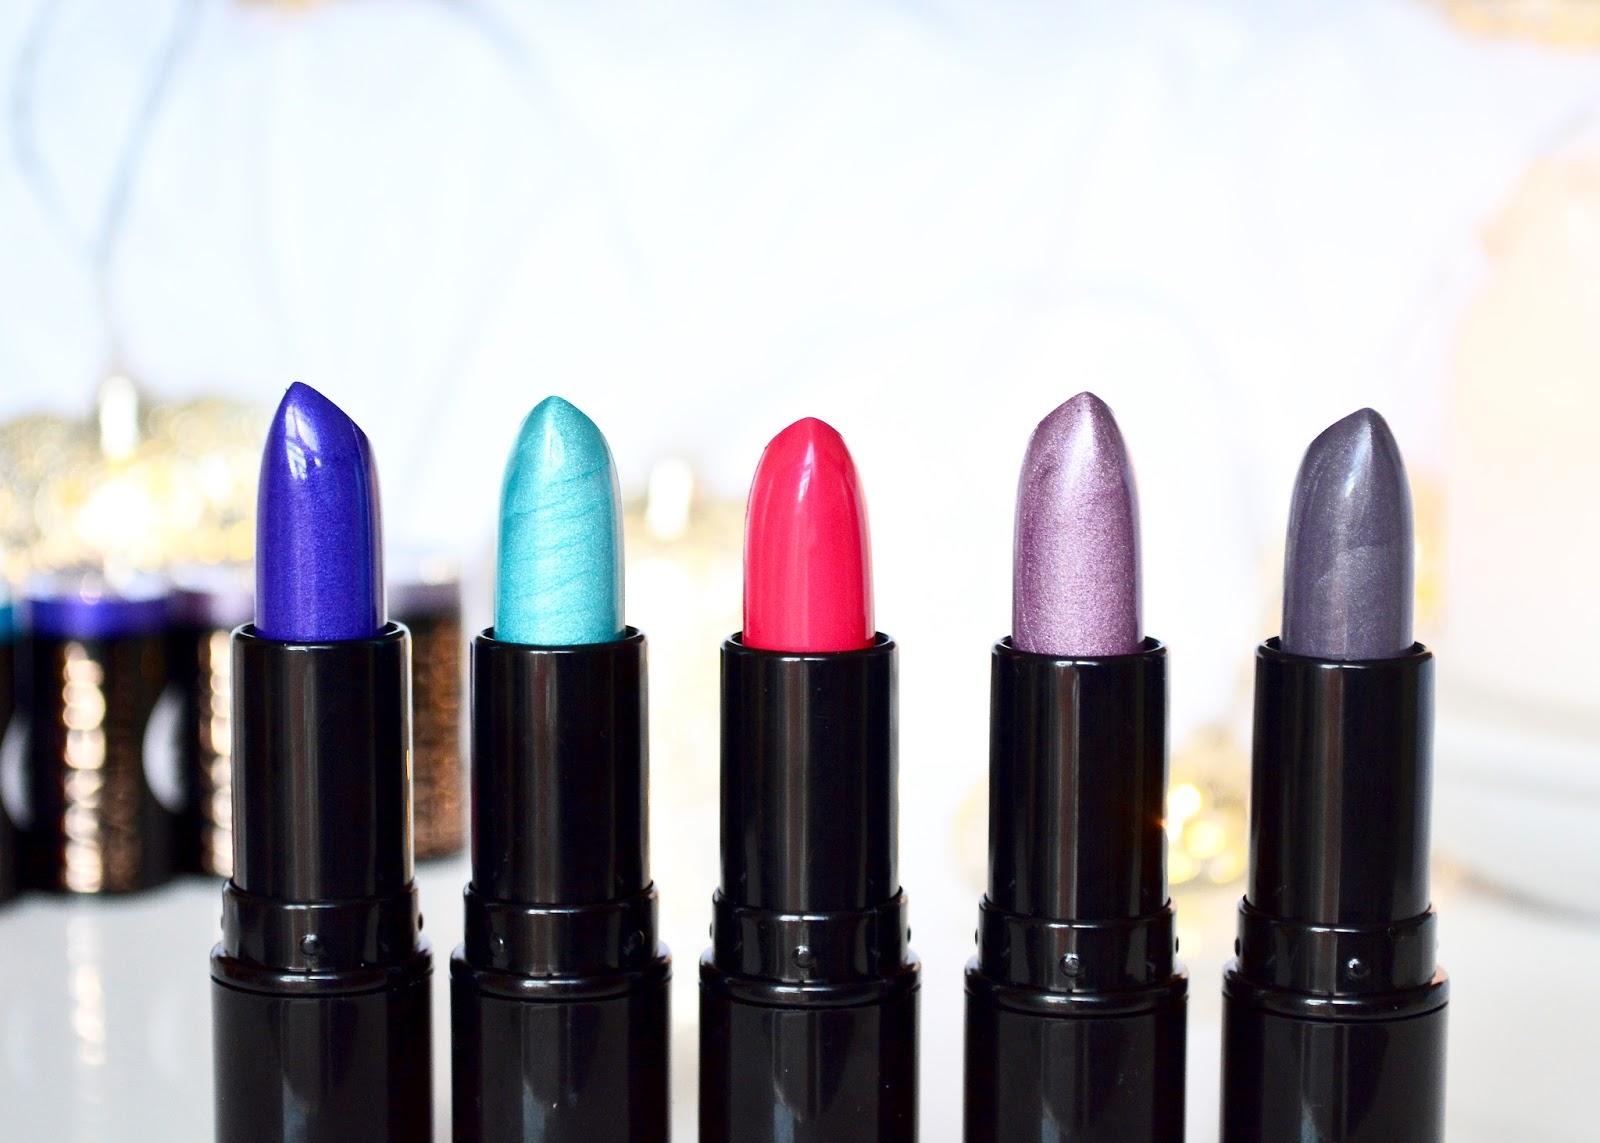 Makeup Revolution, Makeup Revolution Unicorns Unite Lipsticks, Lipsticks, Unicorns Unite, Makeup, Lipstick Collection, Collection, Review,